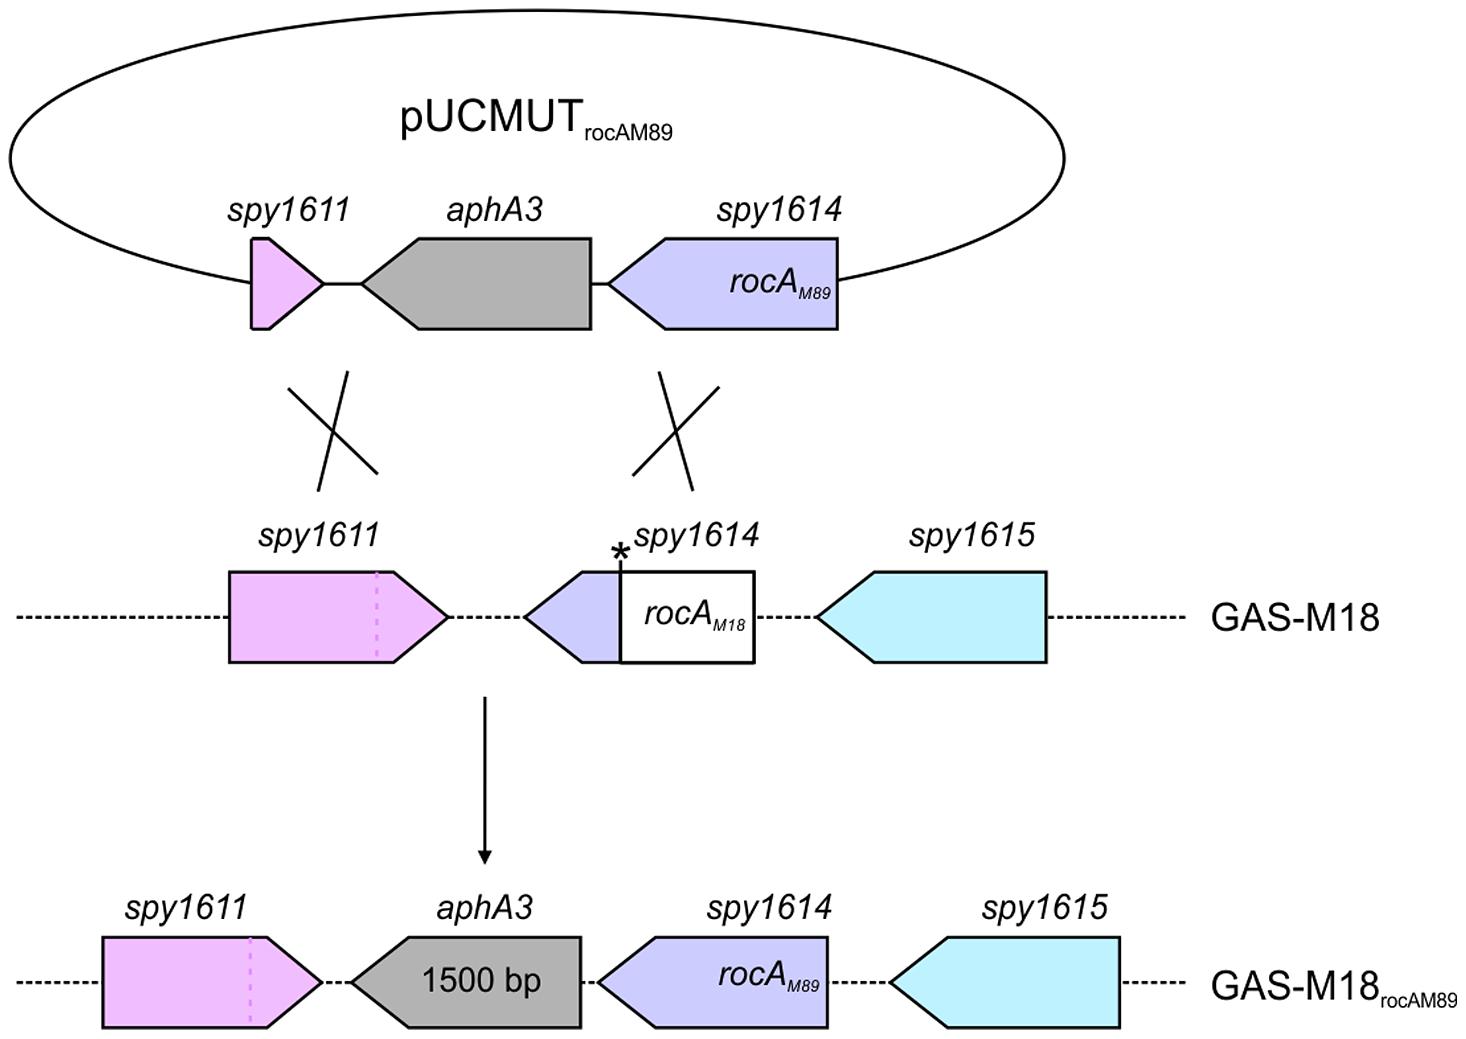 Allelic exchange mutagenesis of <i>rocA</i><sub>M18</sub> with <i>rocA</i><sub>M89</sub> in GAS-M18.